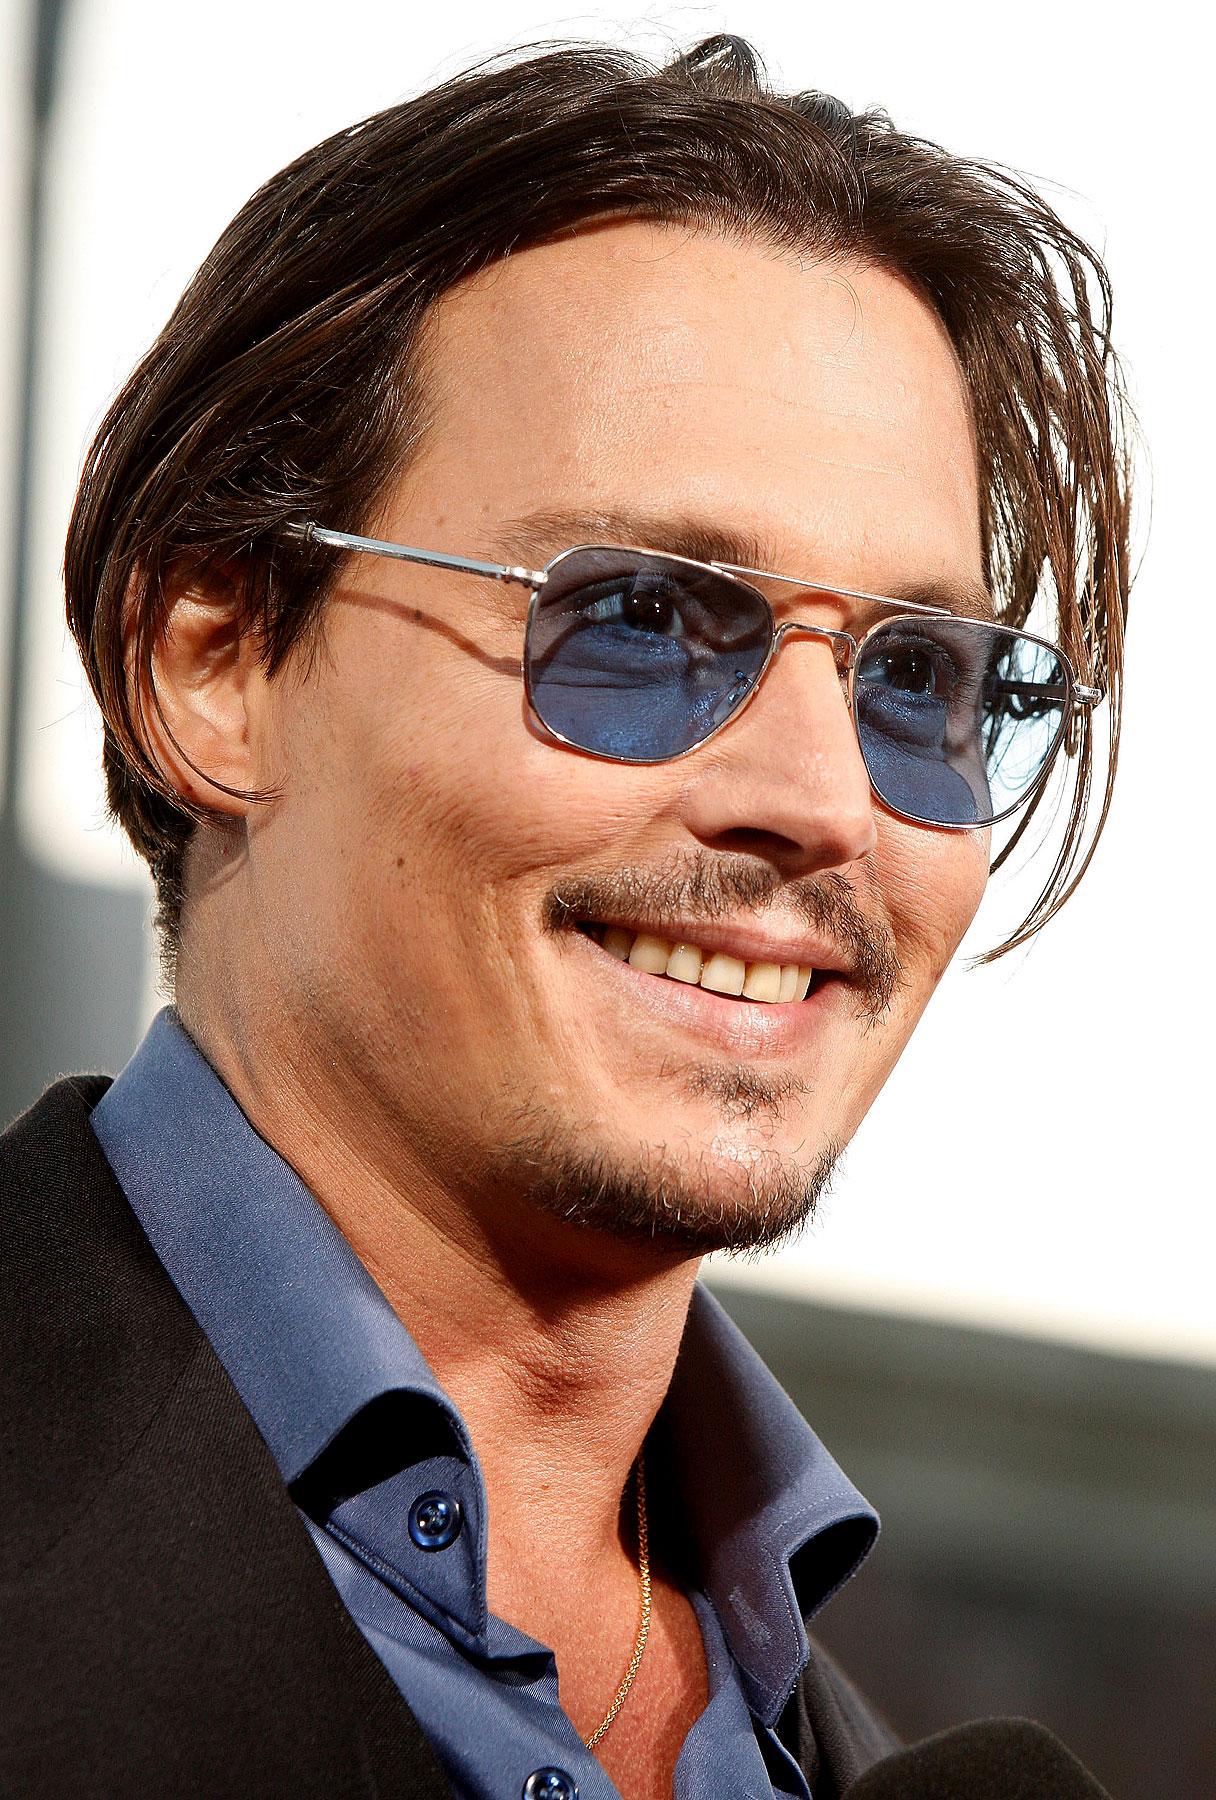 Johnny Depp Is a Good Tipper